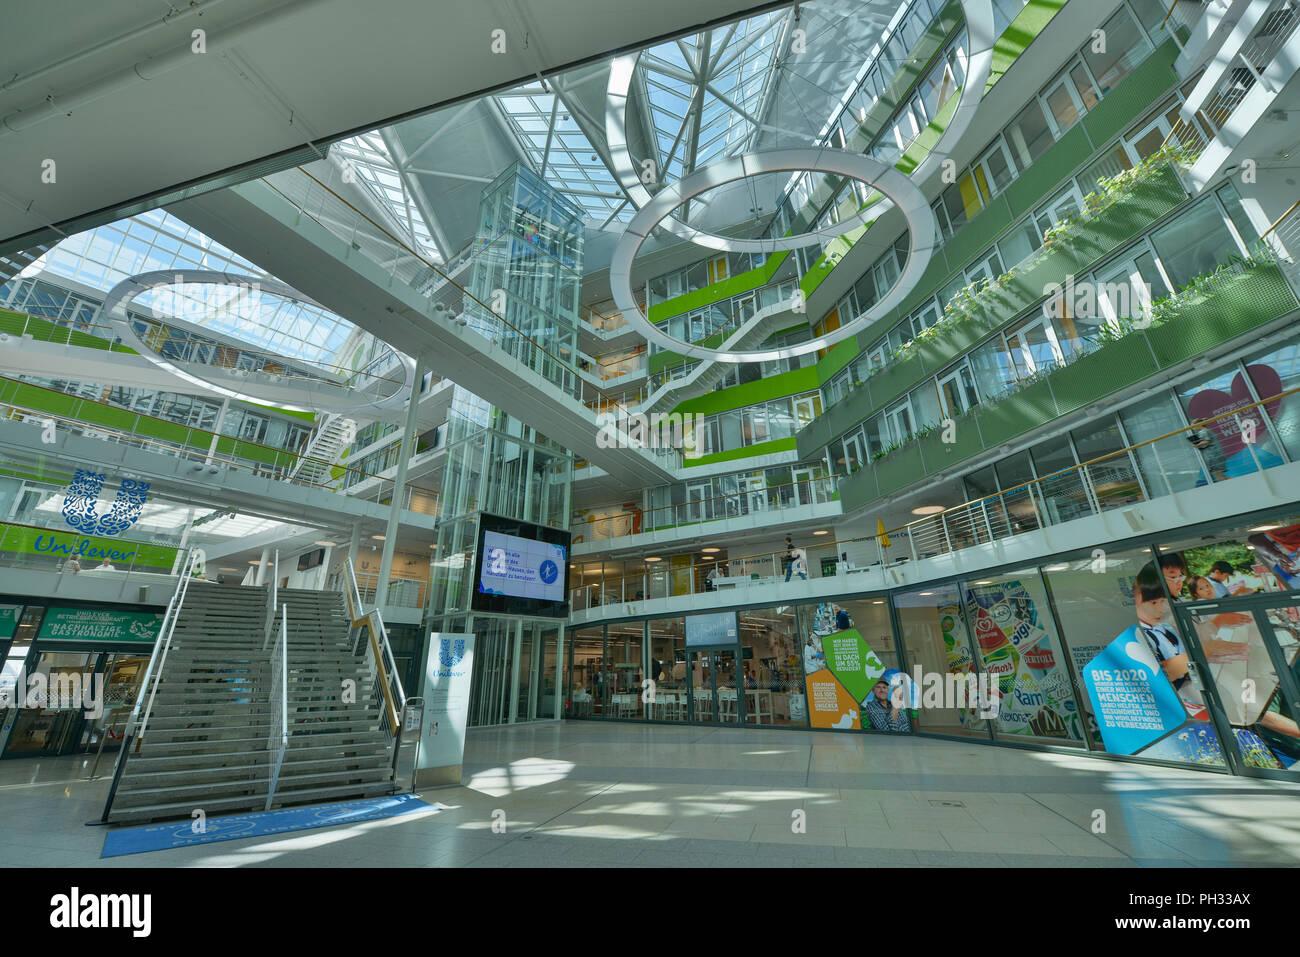 Unilever-Haus, Strandkai, Hafencity, Hamburg, Deutschland Stock Photo